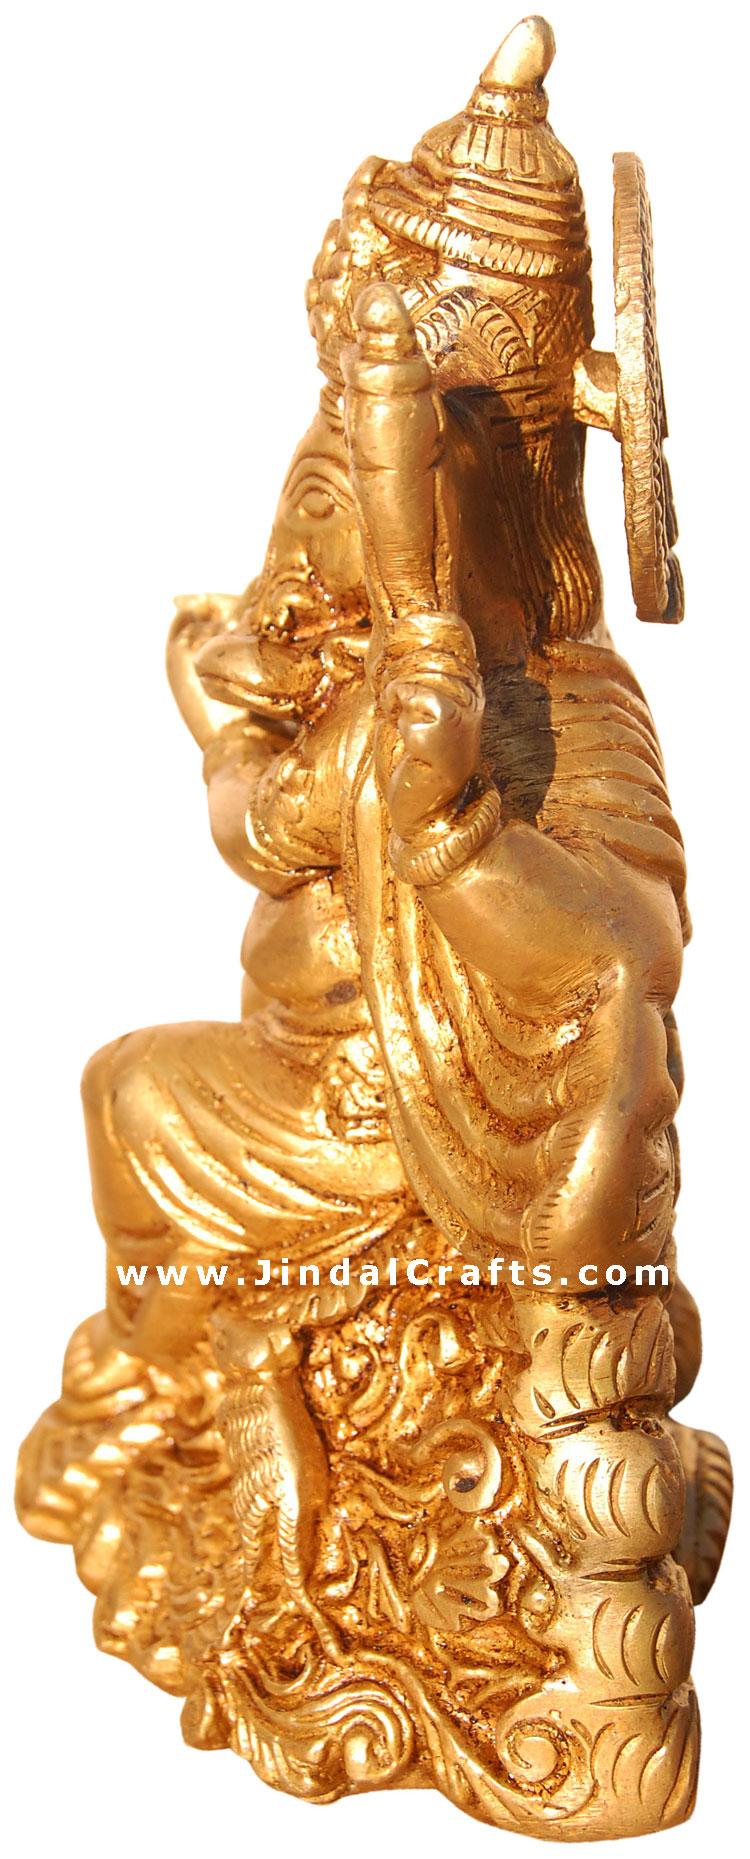 Lord Ganesh Hindu God Figure Artifact Made From Brass